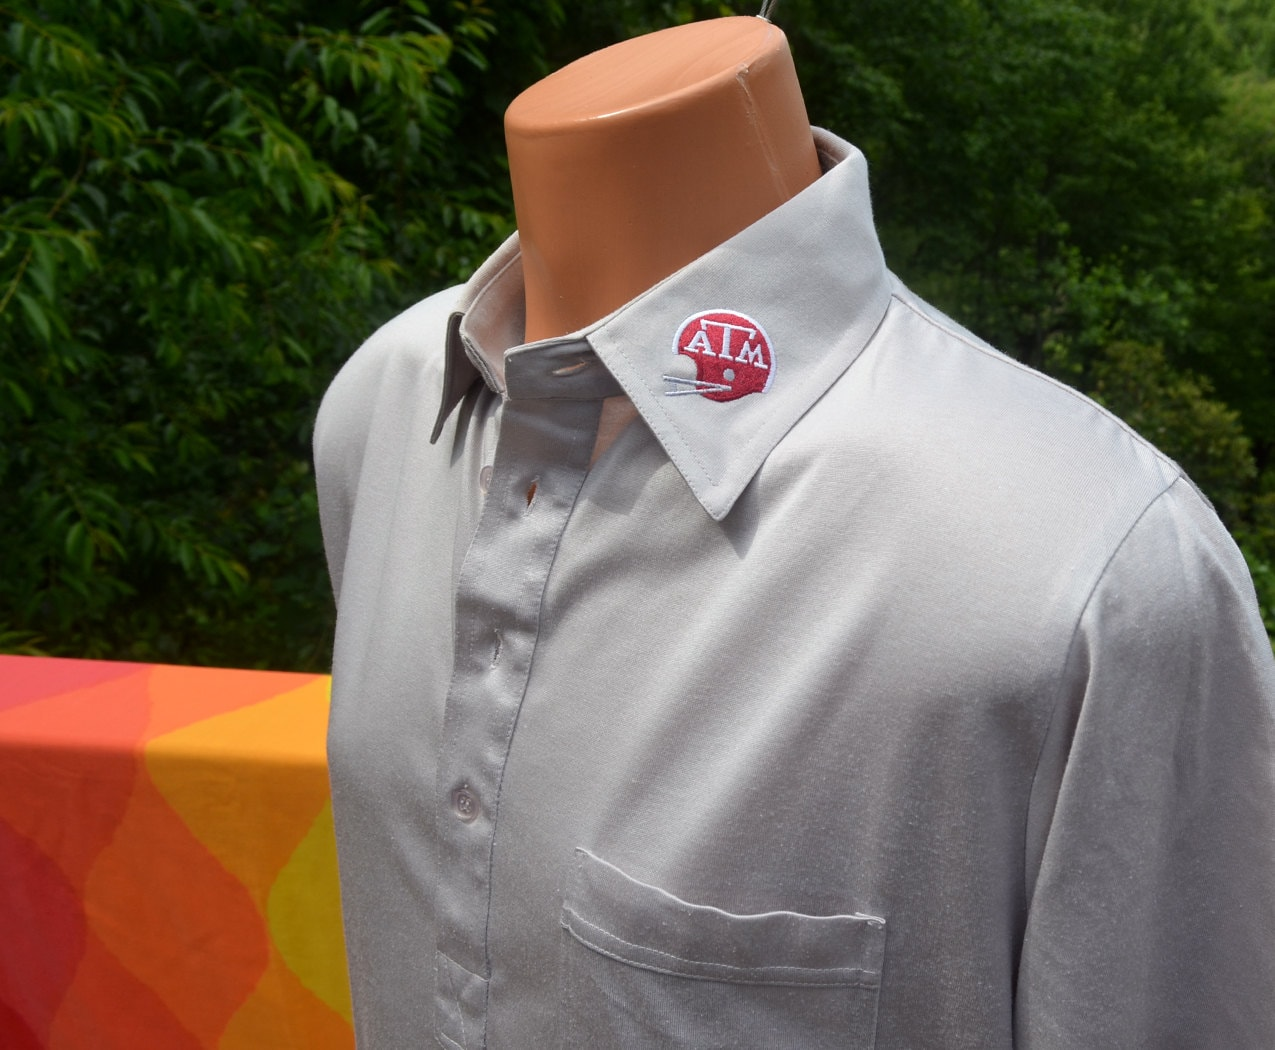 Vintage 70s polo golf shirt texas a m university by skippyhaha for Texas a m golf shirt